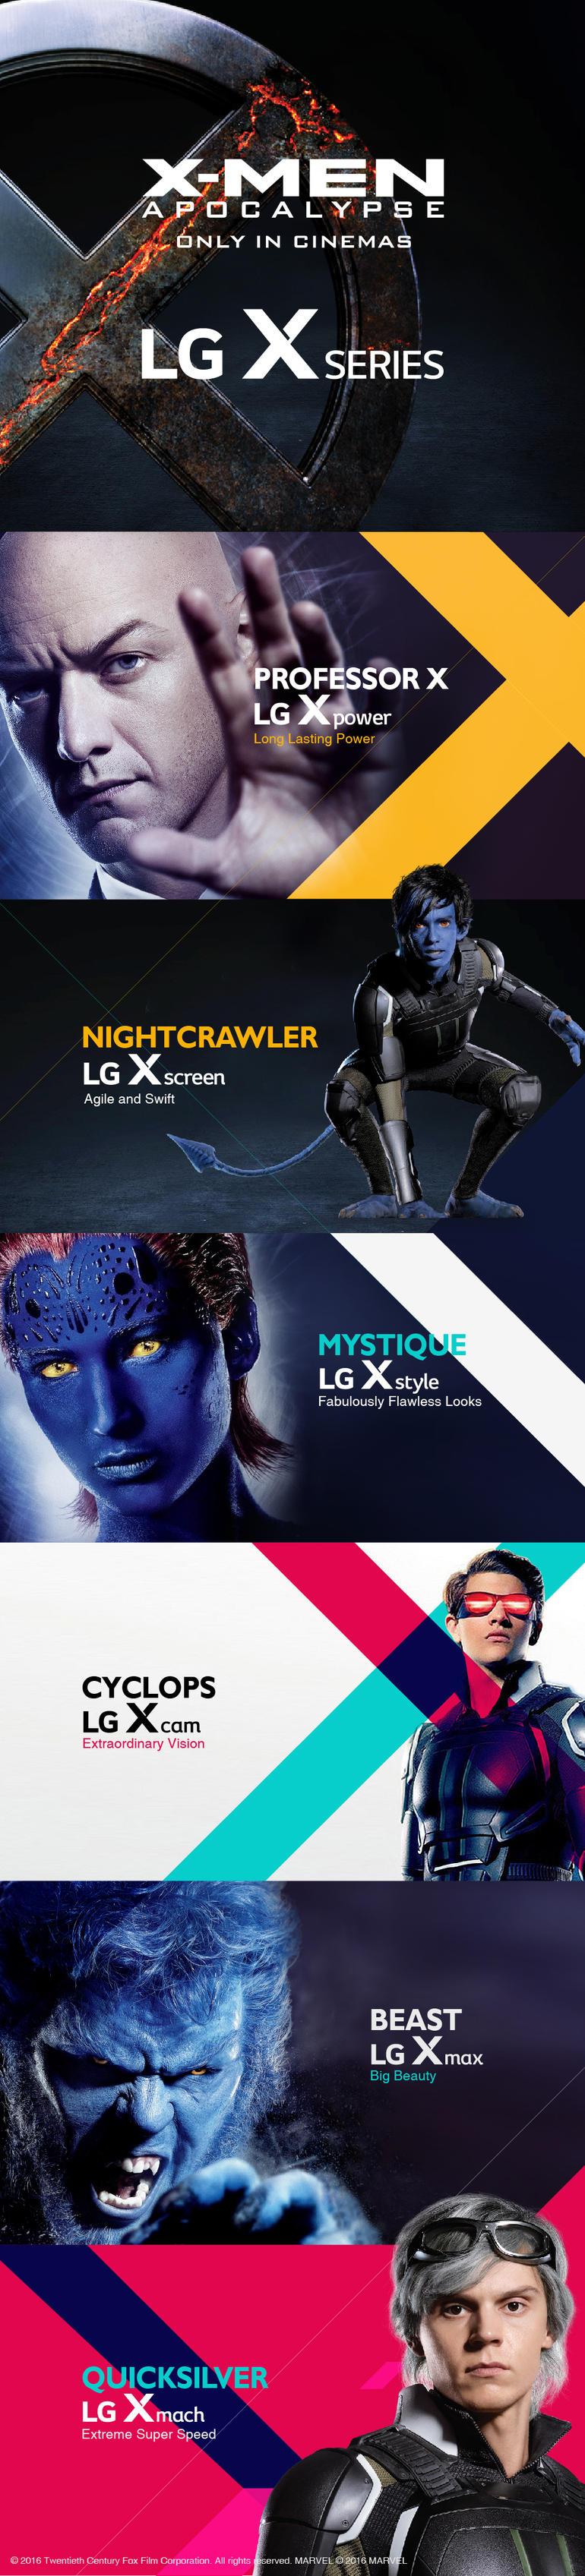 telefoane cu tematica X-Men Apocalypse